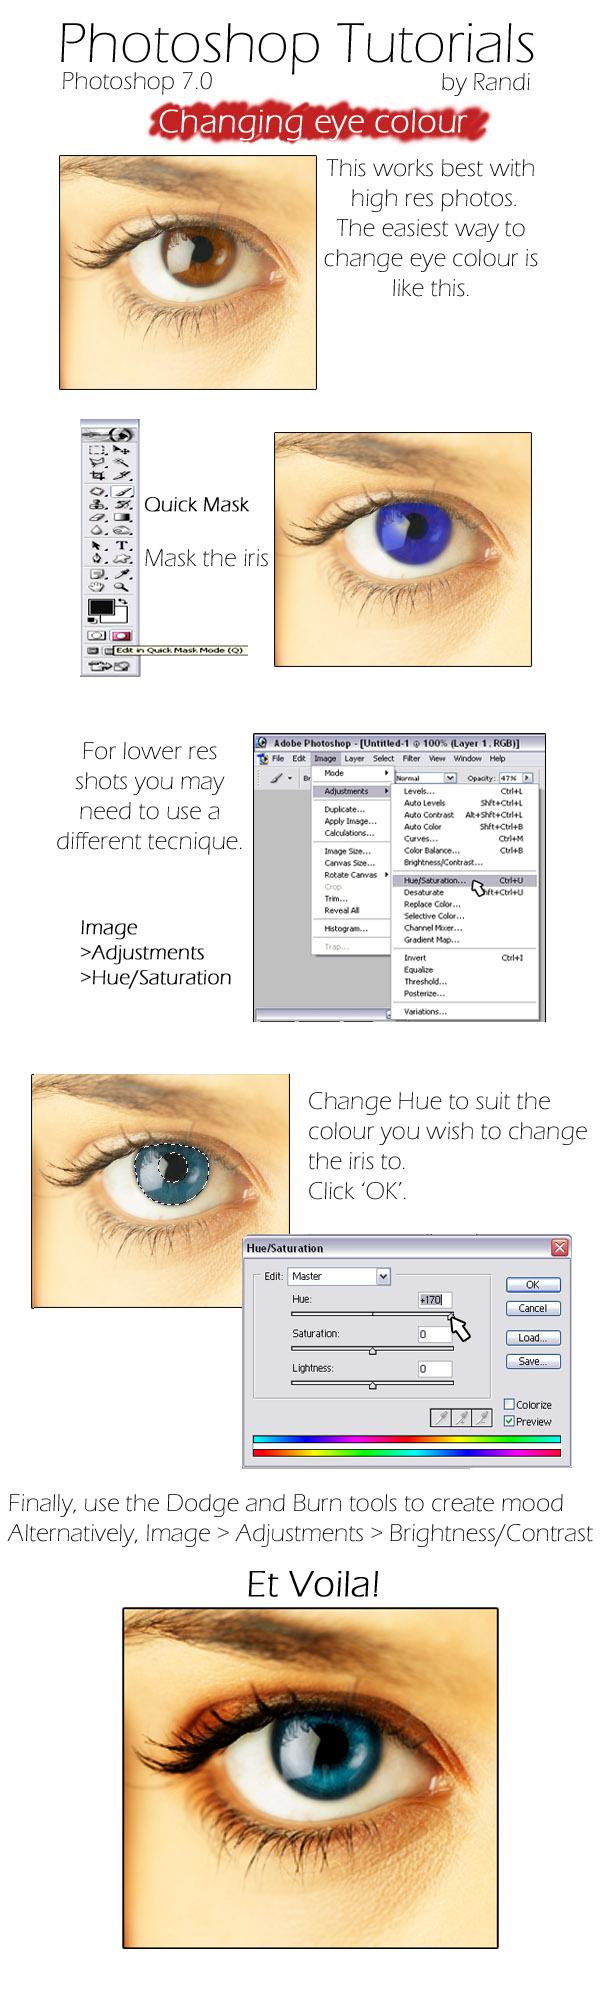 RT - Changing Eye Colour by Randi-Tutorials